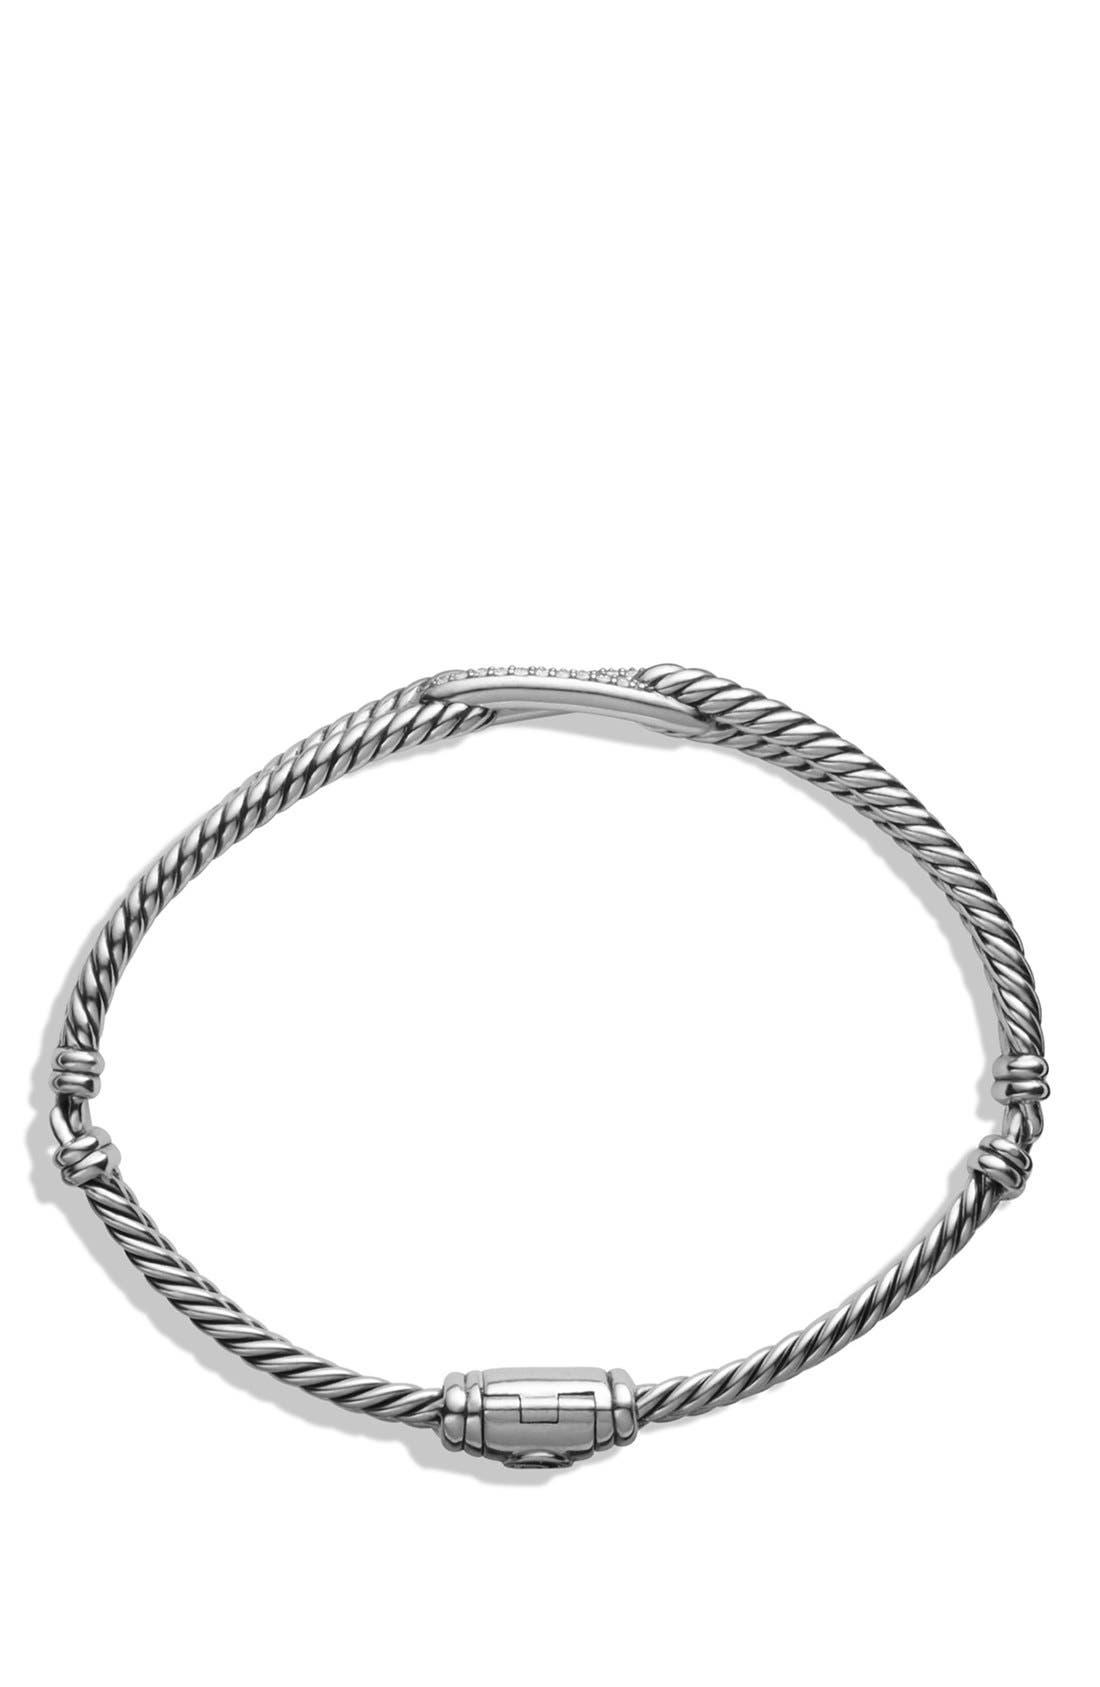 Petite Pavé 'Labyrinth' Mini Single Loop Bracelet with Diamonds in Gold,                             Alternate thumbnail 3, color,                             DIAMOND/ SILVER